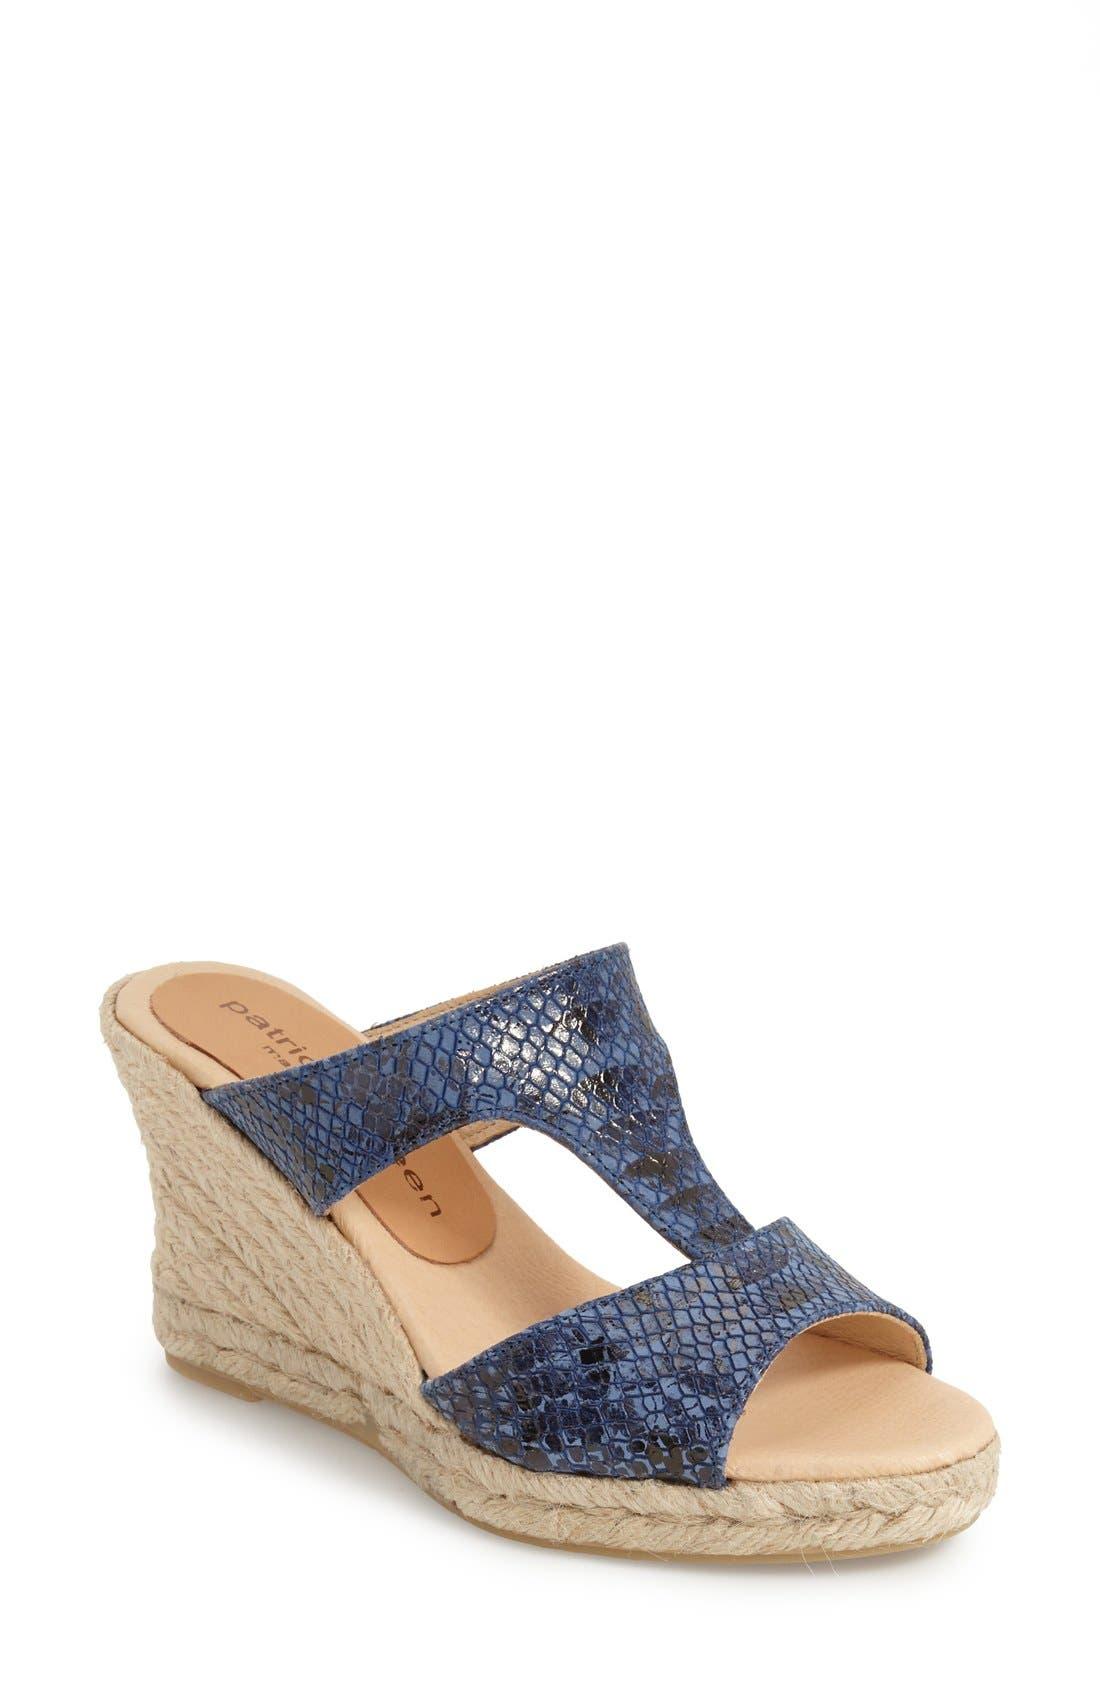 Snake Embossed Wedge Sandal,                         Main,                         color, Cobalt